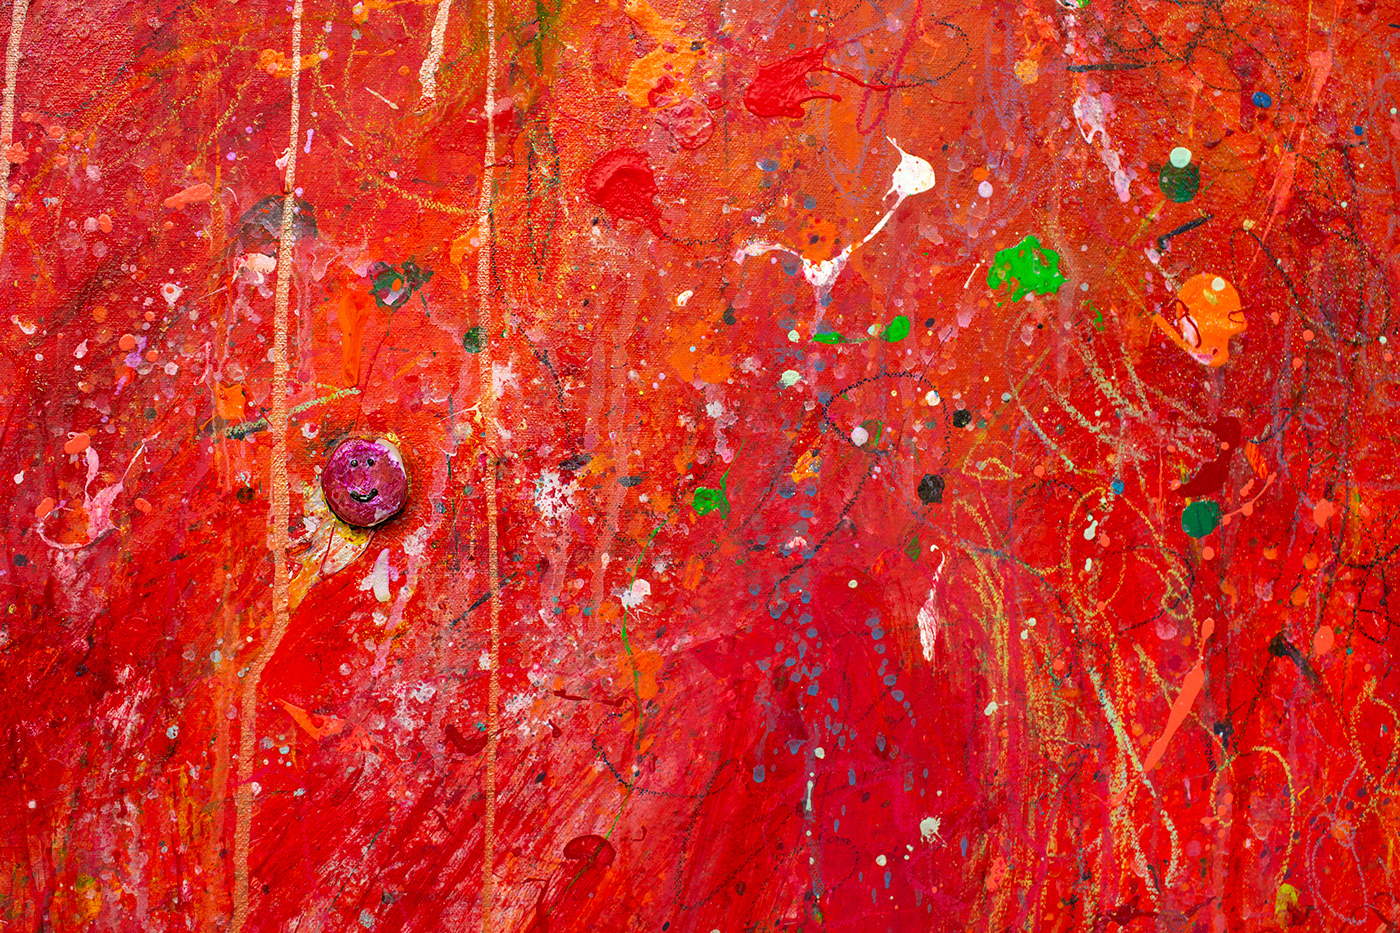 FINEART painting   abstract abstractart artgallery Modernart oilpainting MarylandInstituteCollegeOfArt MICA experimental